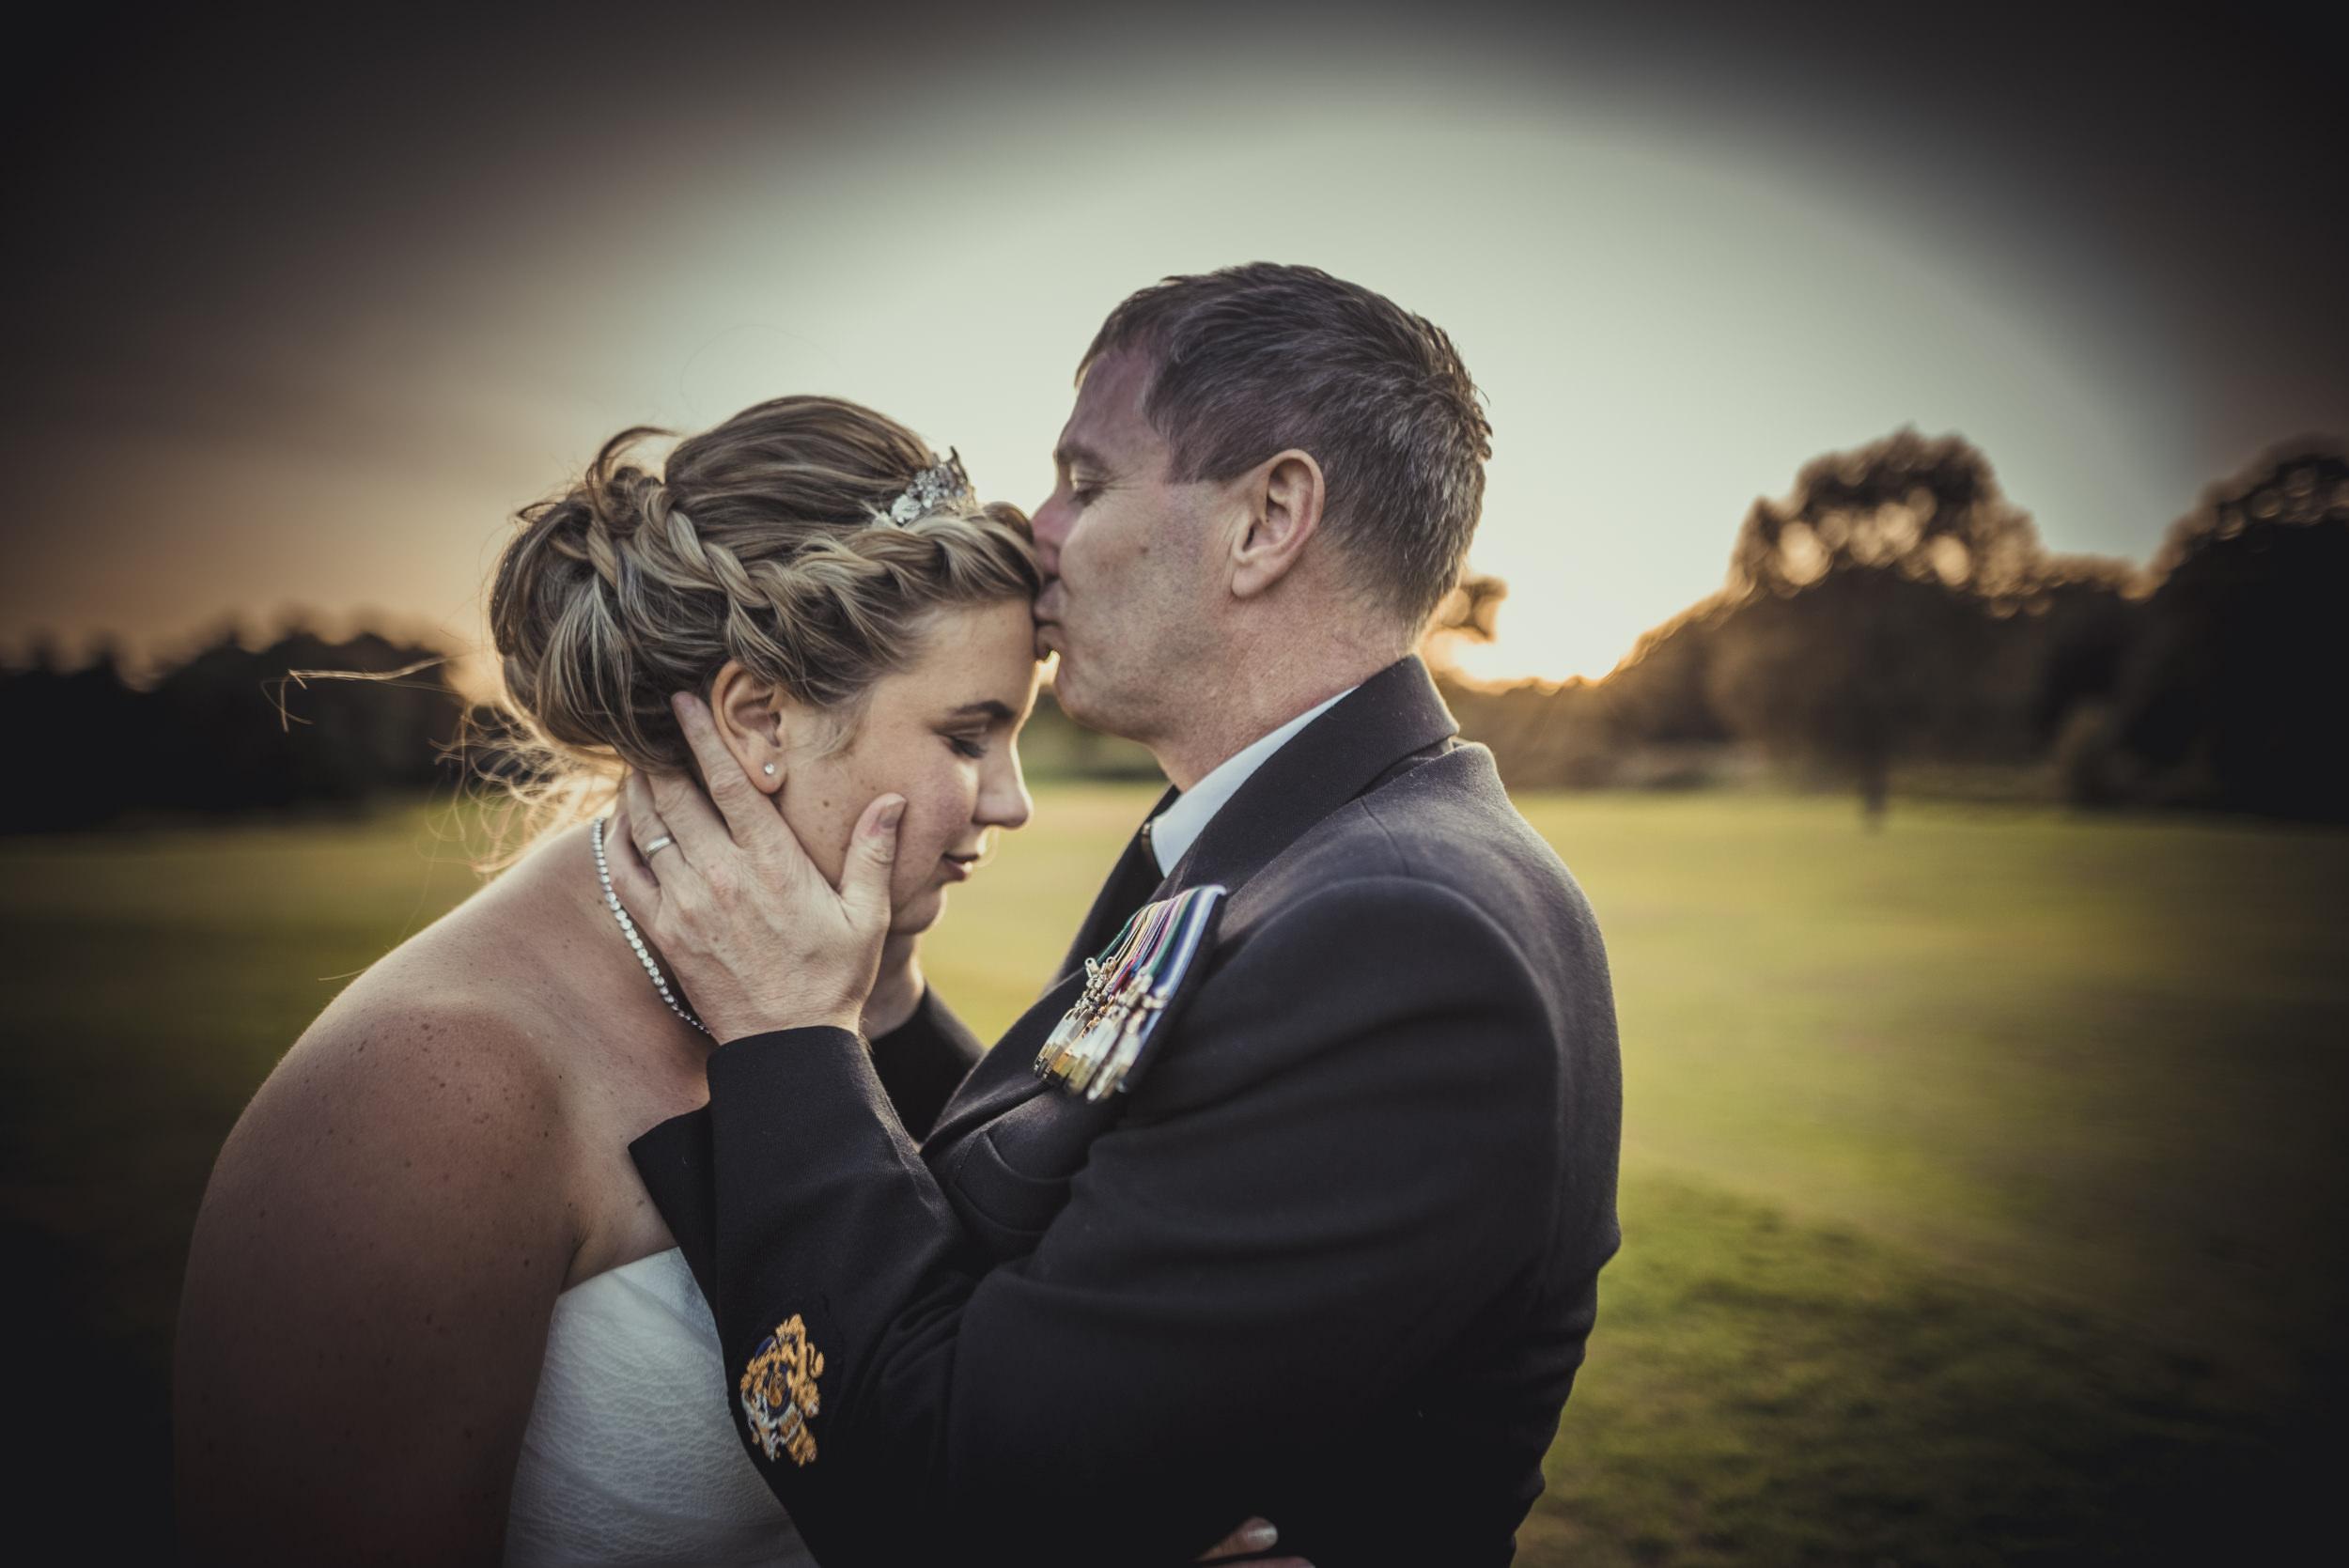 Chantelle-and-Stephen-Old-Thorns-Hotel-Wedding-Liphook-Manu-Mendoza-Wedding-Photography-514.jpg